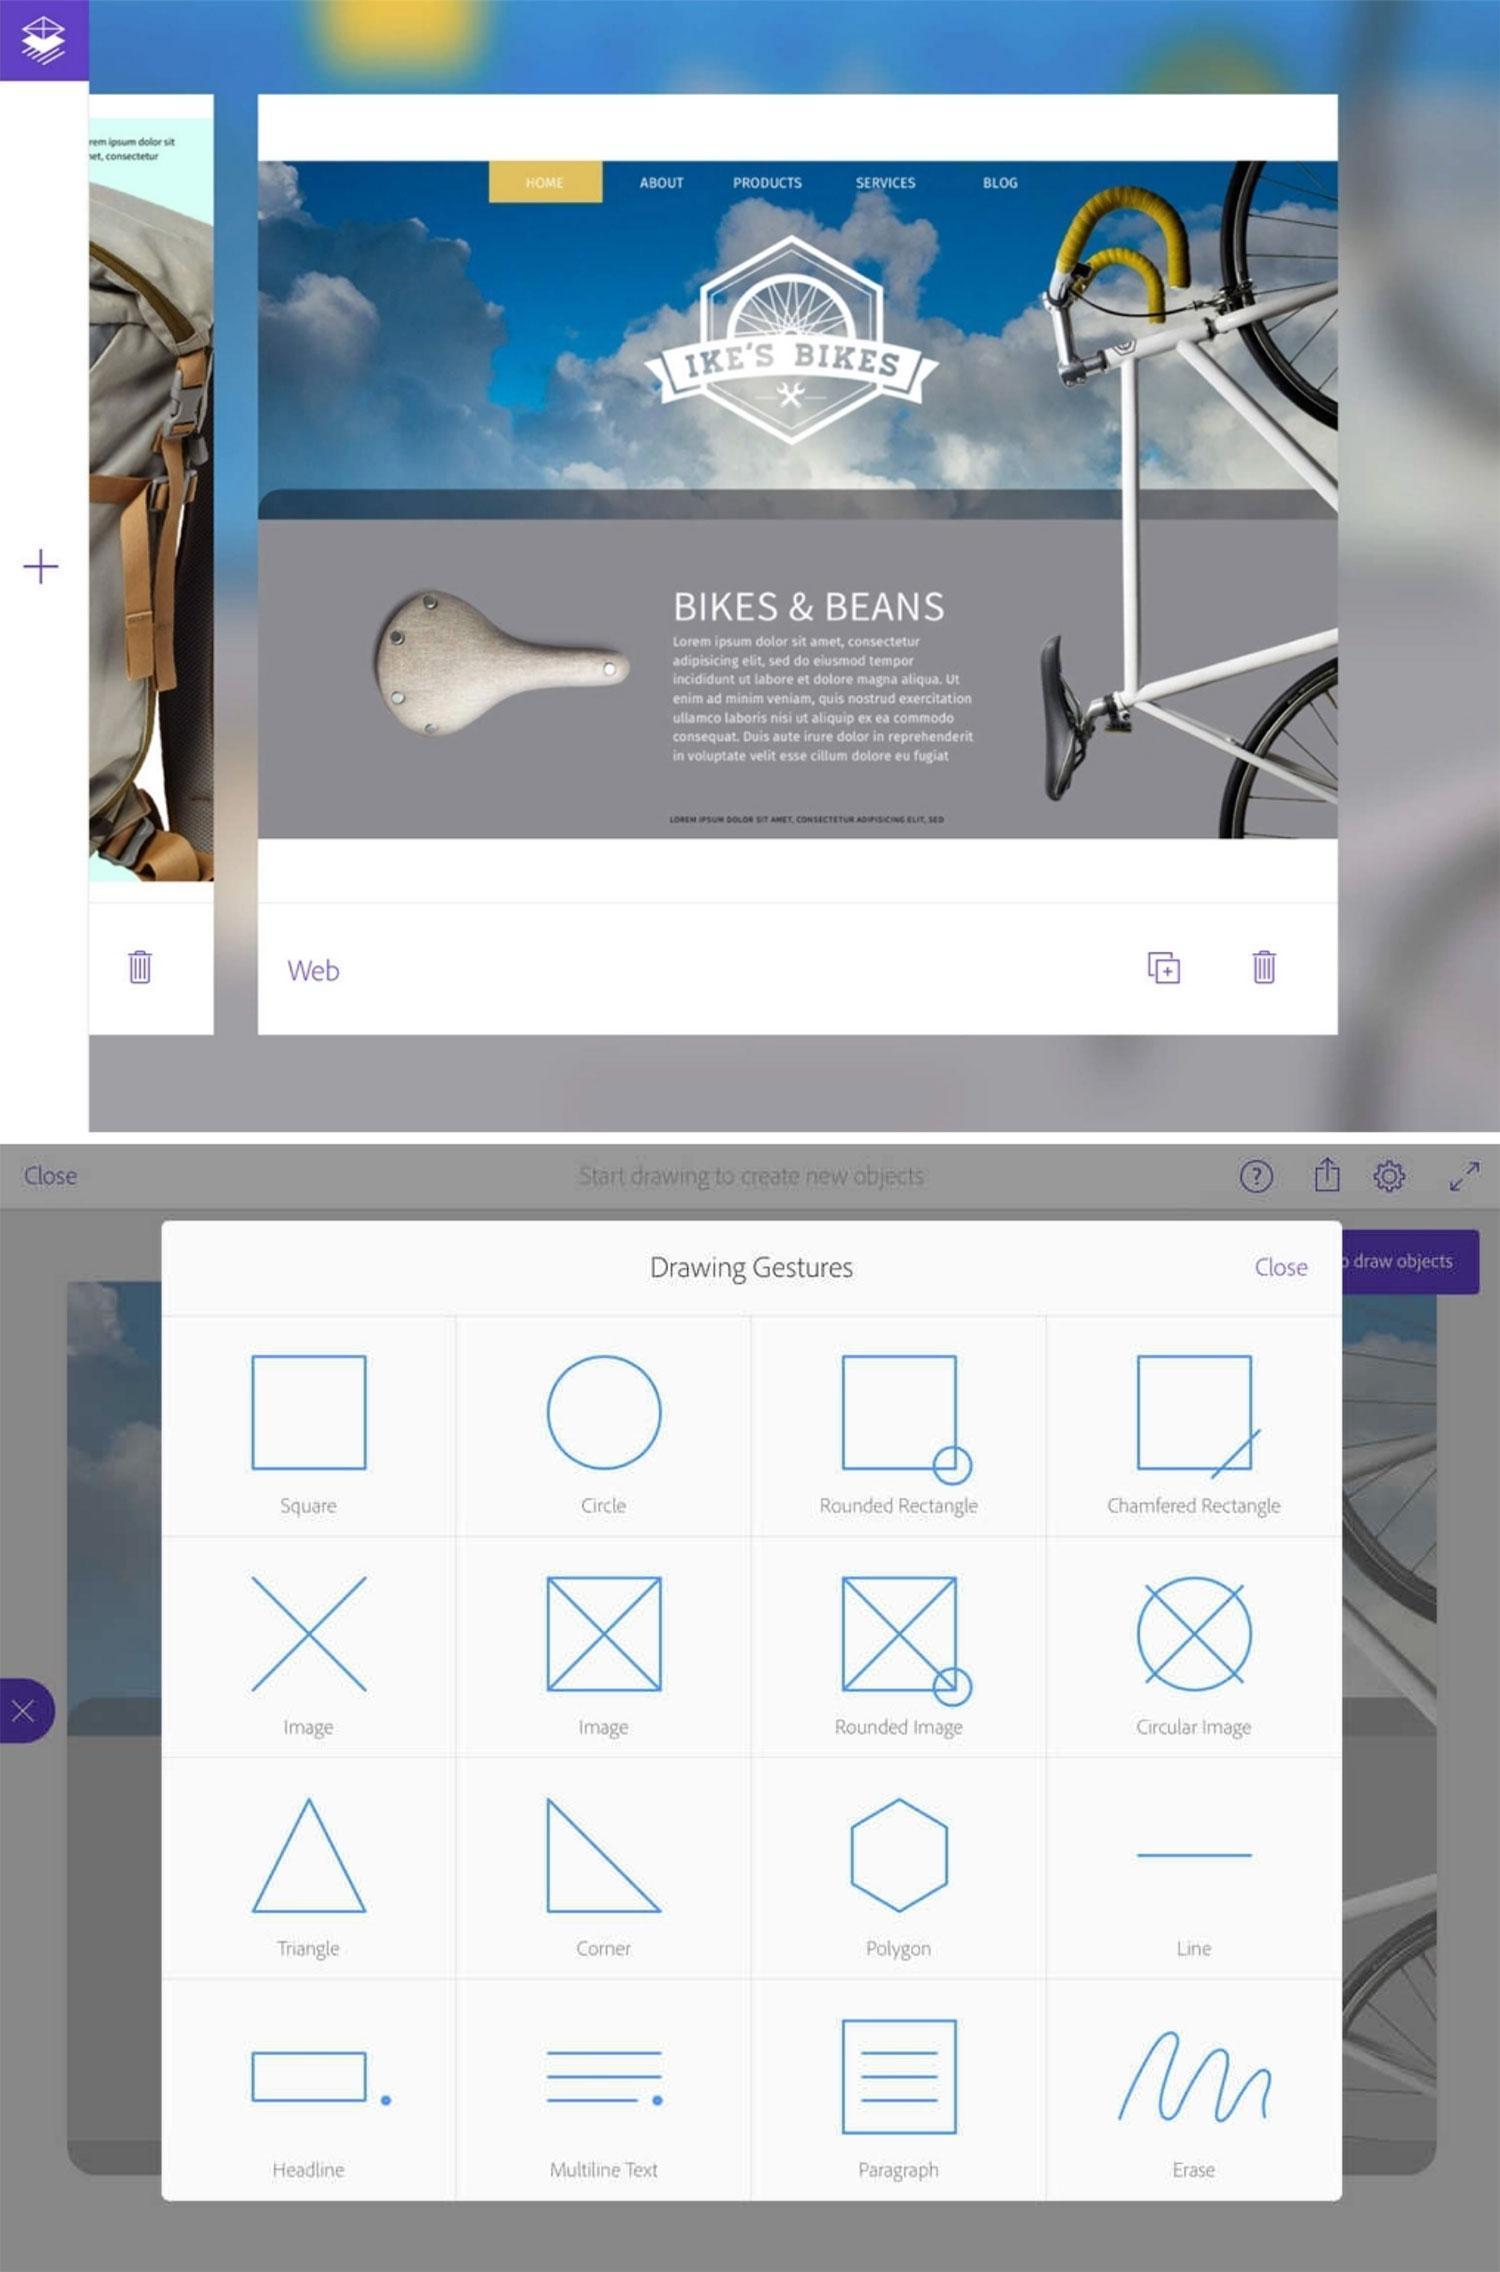 Graphic Design Apps: Adobe Comp